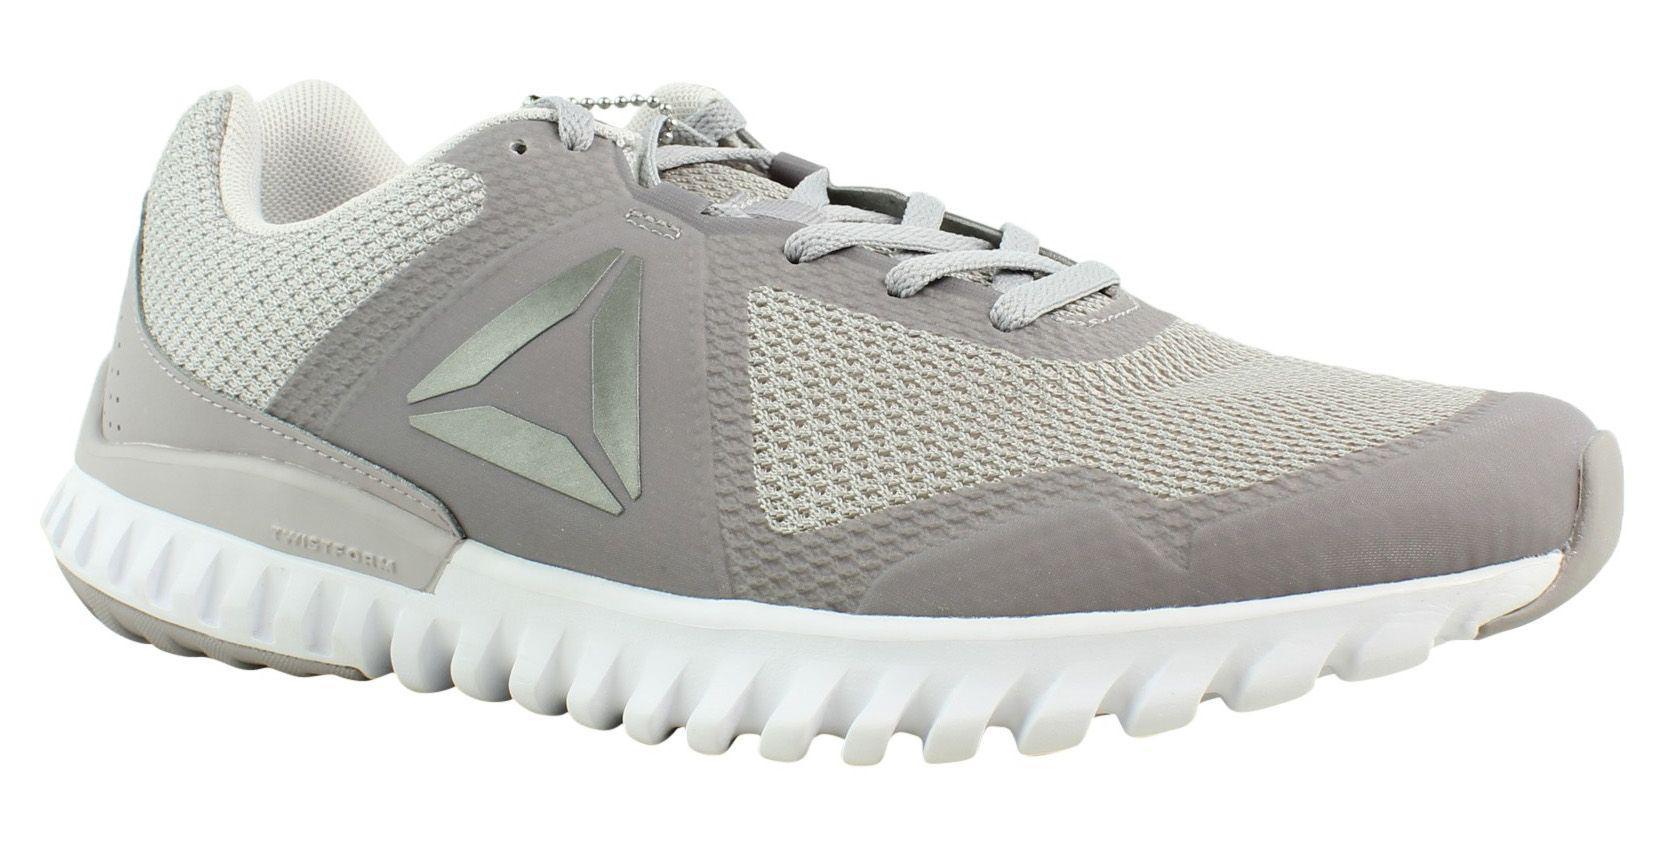 Lyst - Reebok Womens Twistform Blaze 3.0 Mtm Gray Running Shoes in Gray 3eb953da0